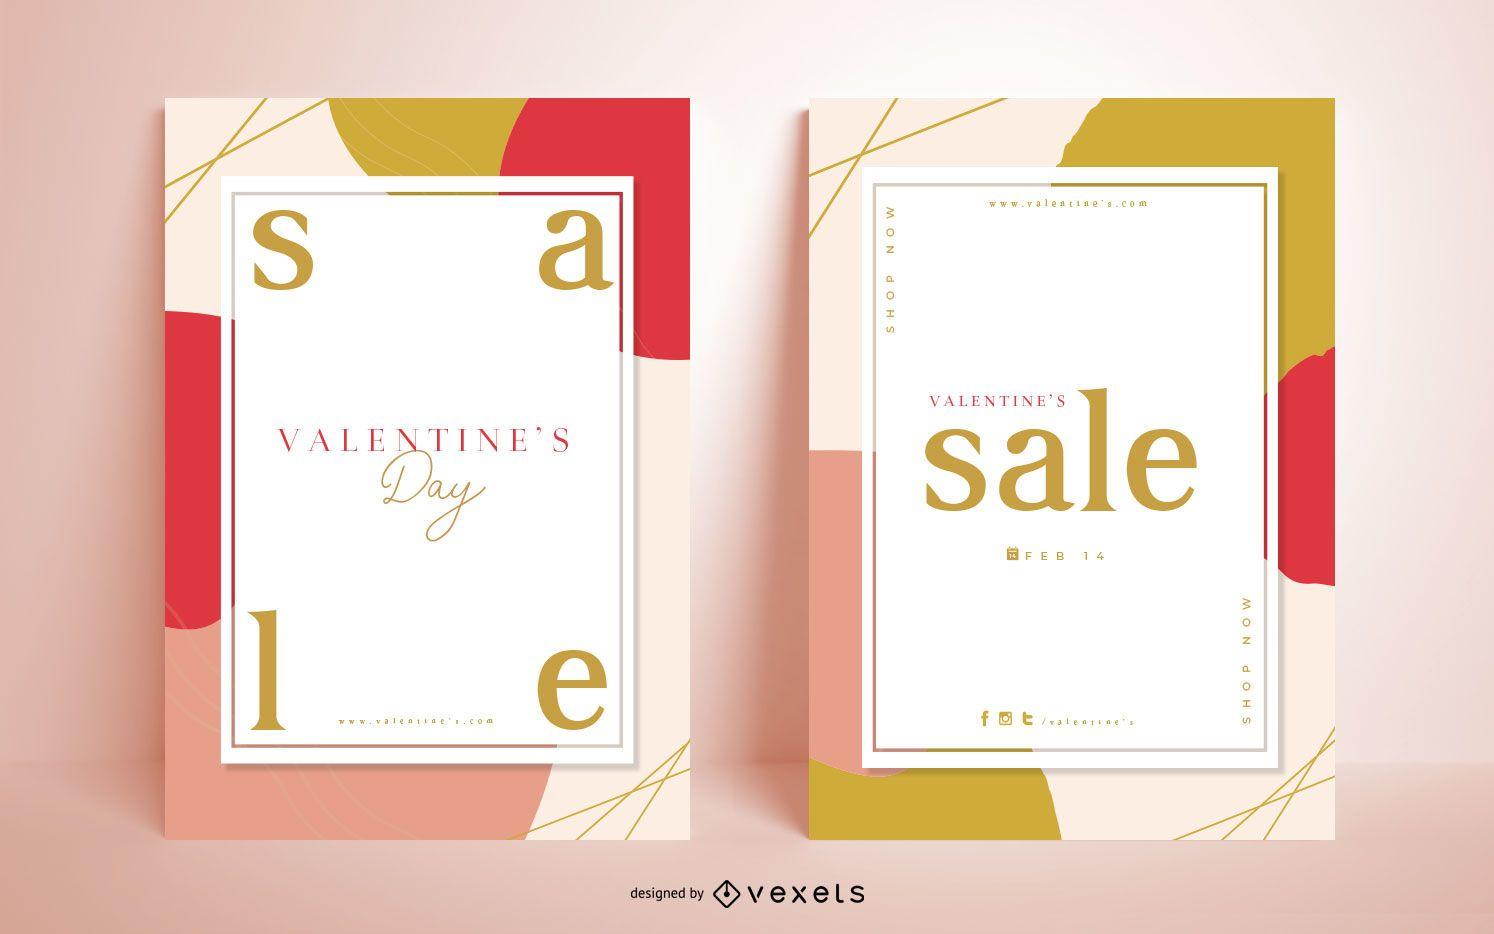 Valentine's Day Seasonal Poster Pack